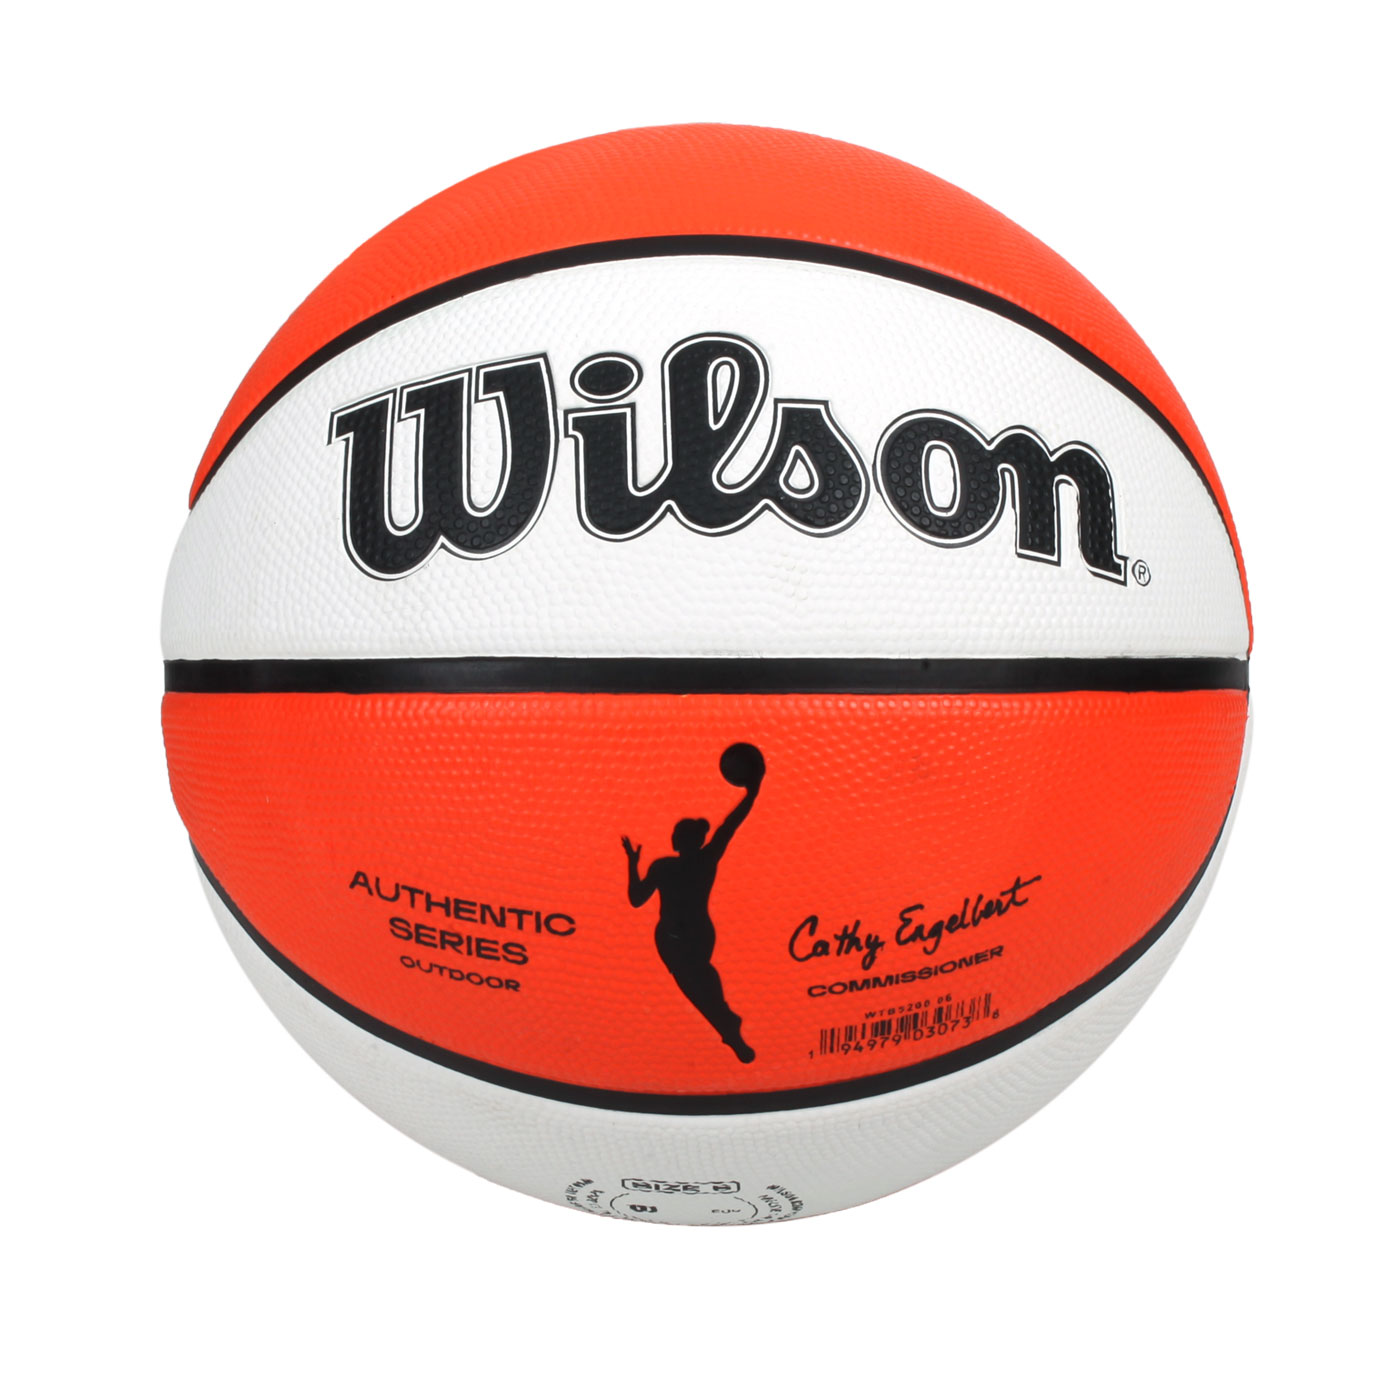 WILSON WNBA AUTH系列室外橡膠籃球#6 WTB5200XB06 - 橘白黑